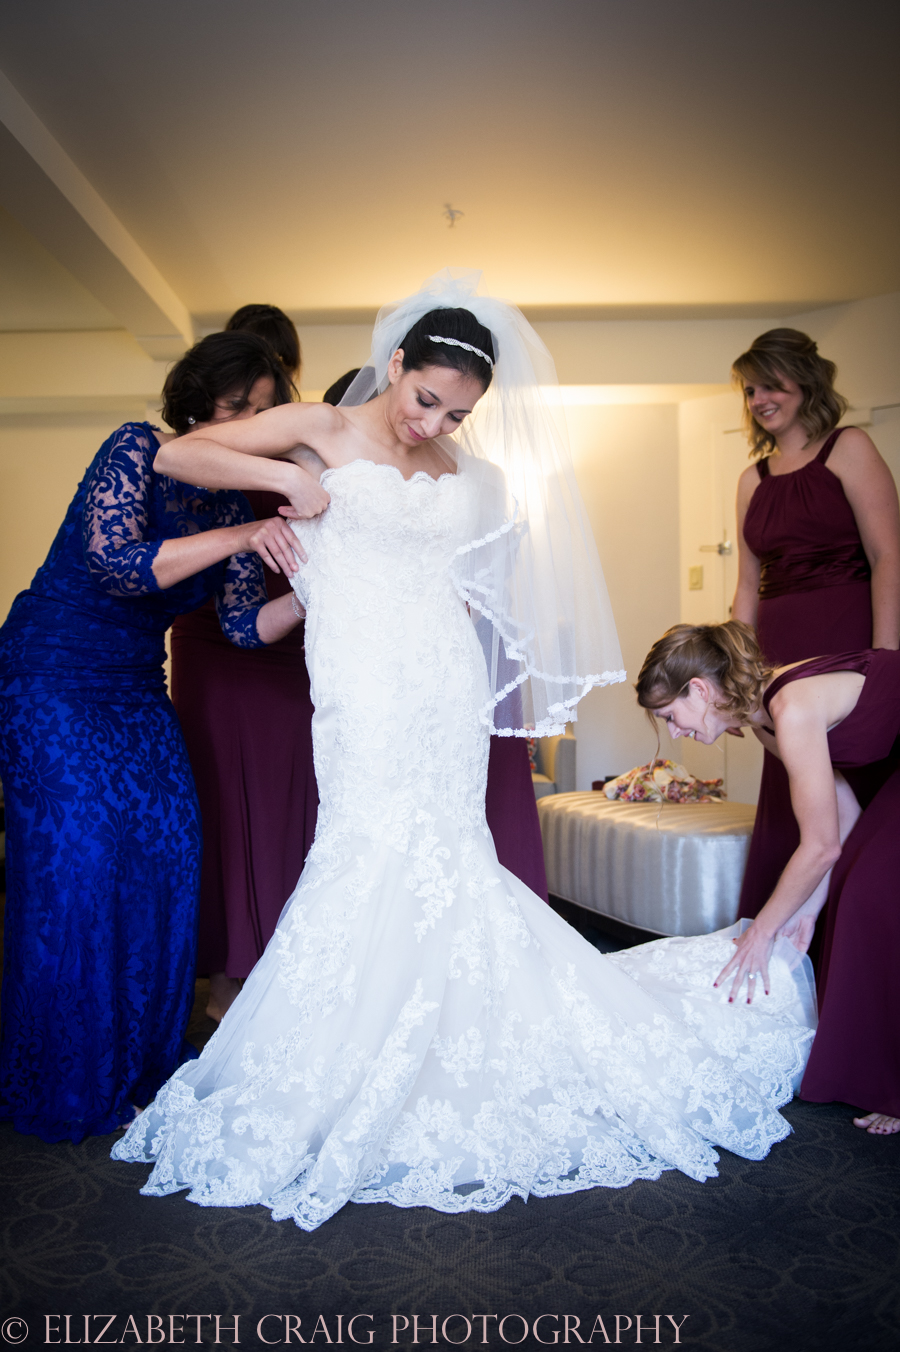 pittsburgh-wedding-photographers-doubletree-pittsburgh-sacred-heart-elizabeth-craig-photography-6